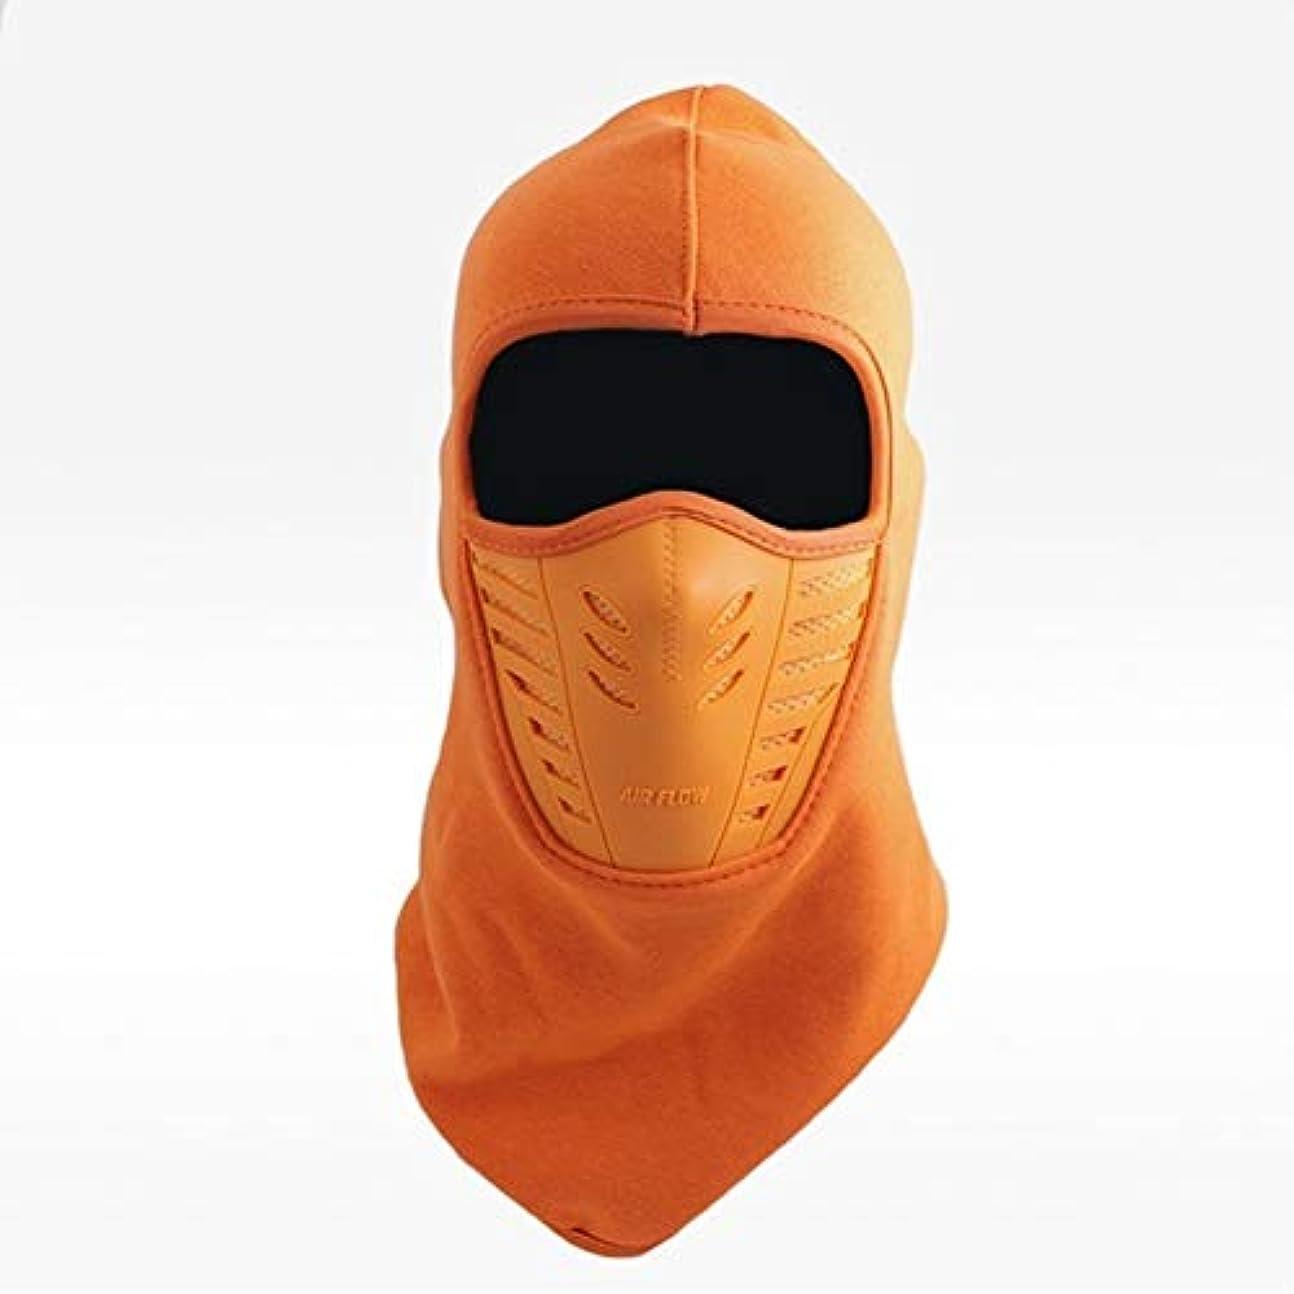 ACHICOO フェイスマスク 自転車 熱 冬暖かい 防風 防寒 帽子 風防 オートバイ ハットネック ヘルメットビーンズ